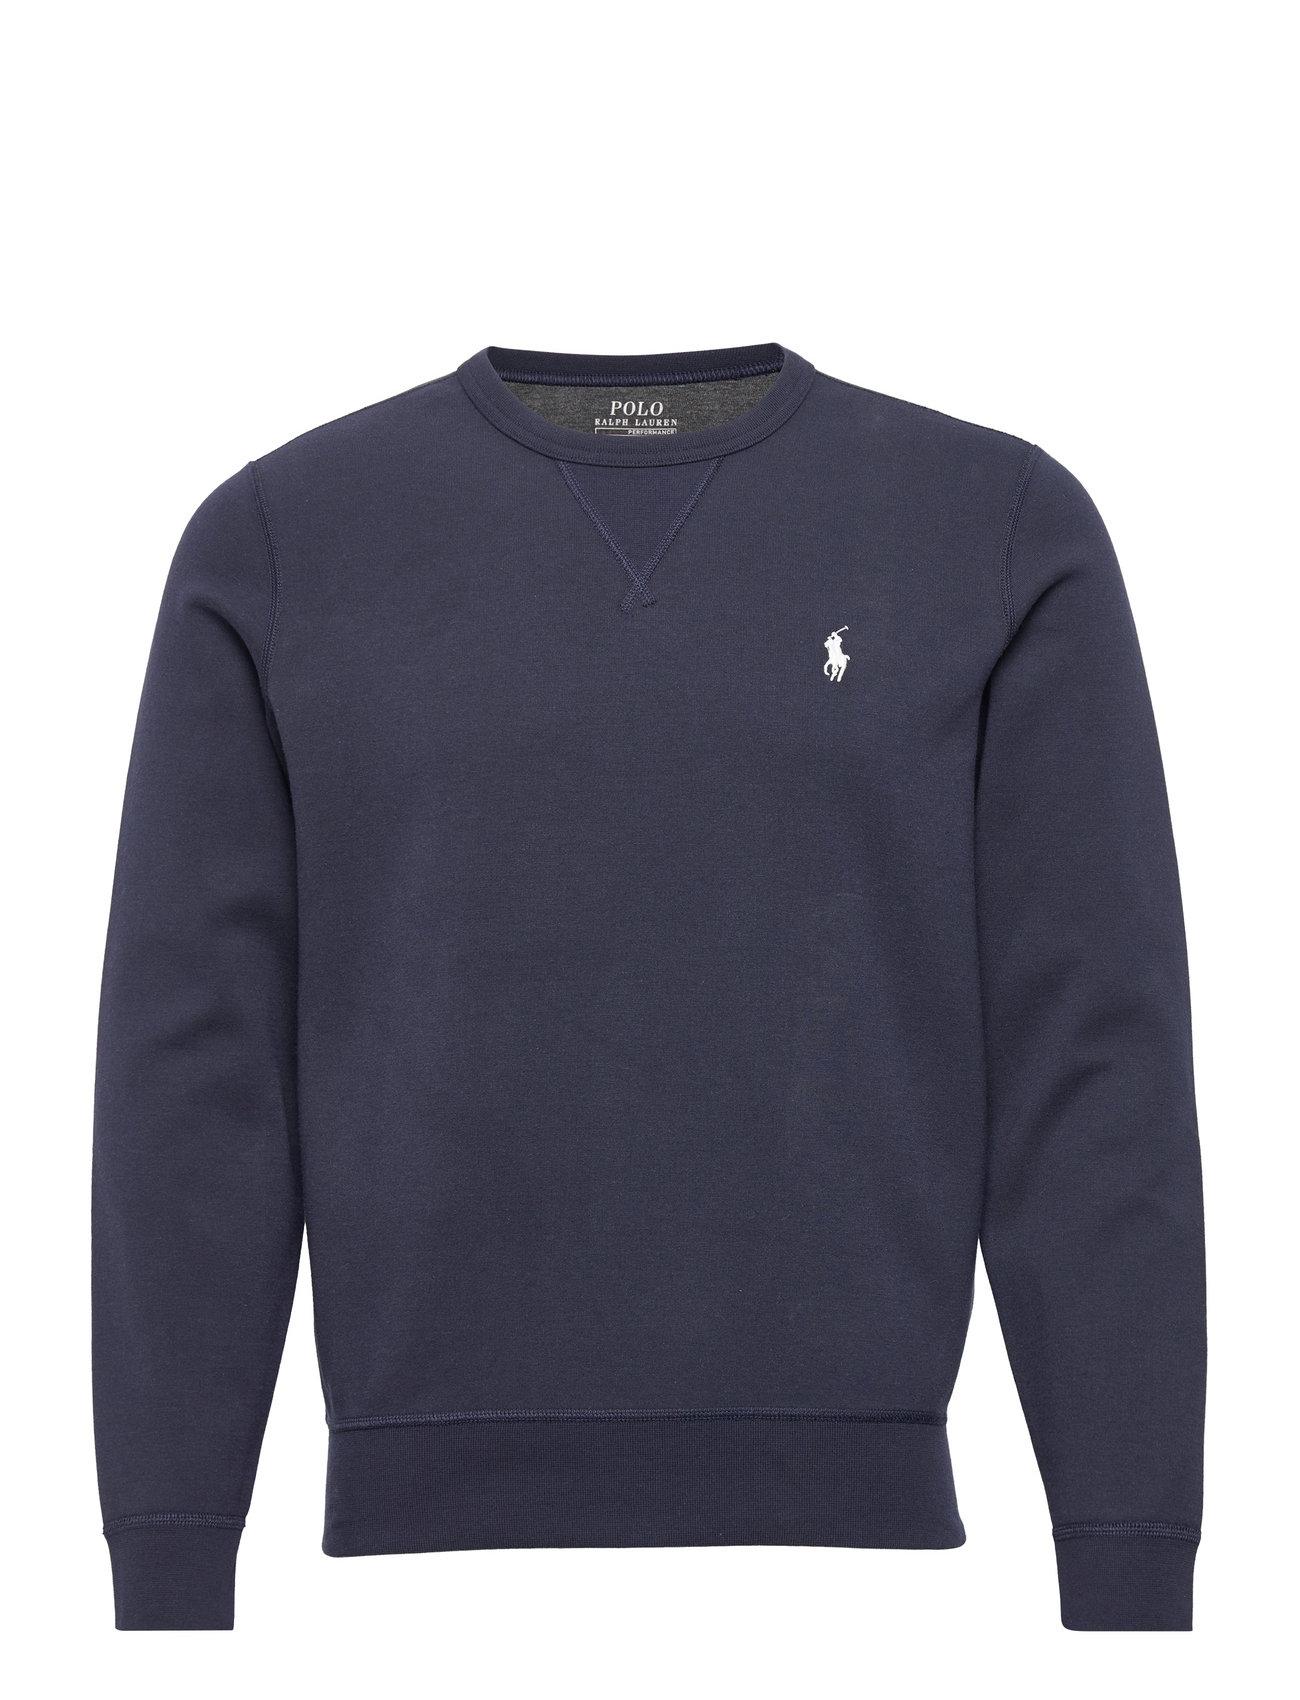 Polo Ralph Lauren Double-Knit Sweatshirt - AVIATOR NAVY